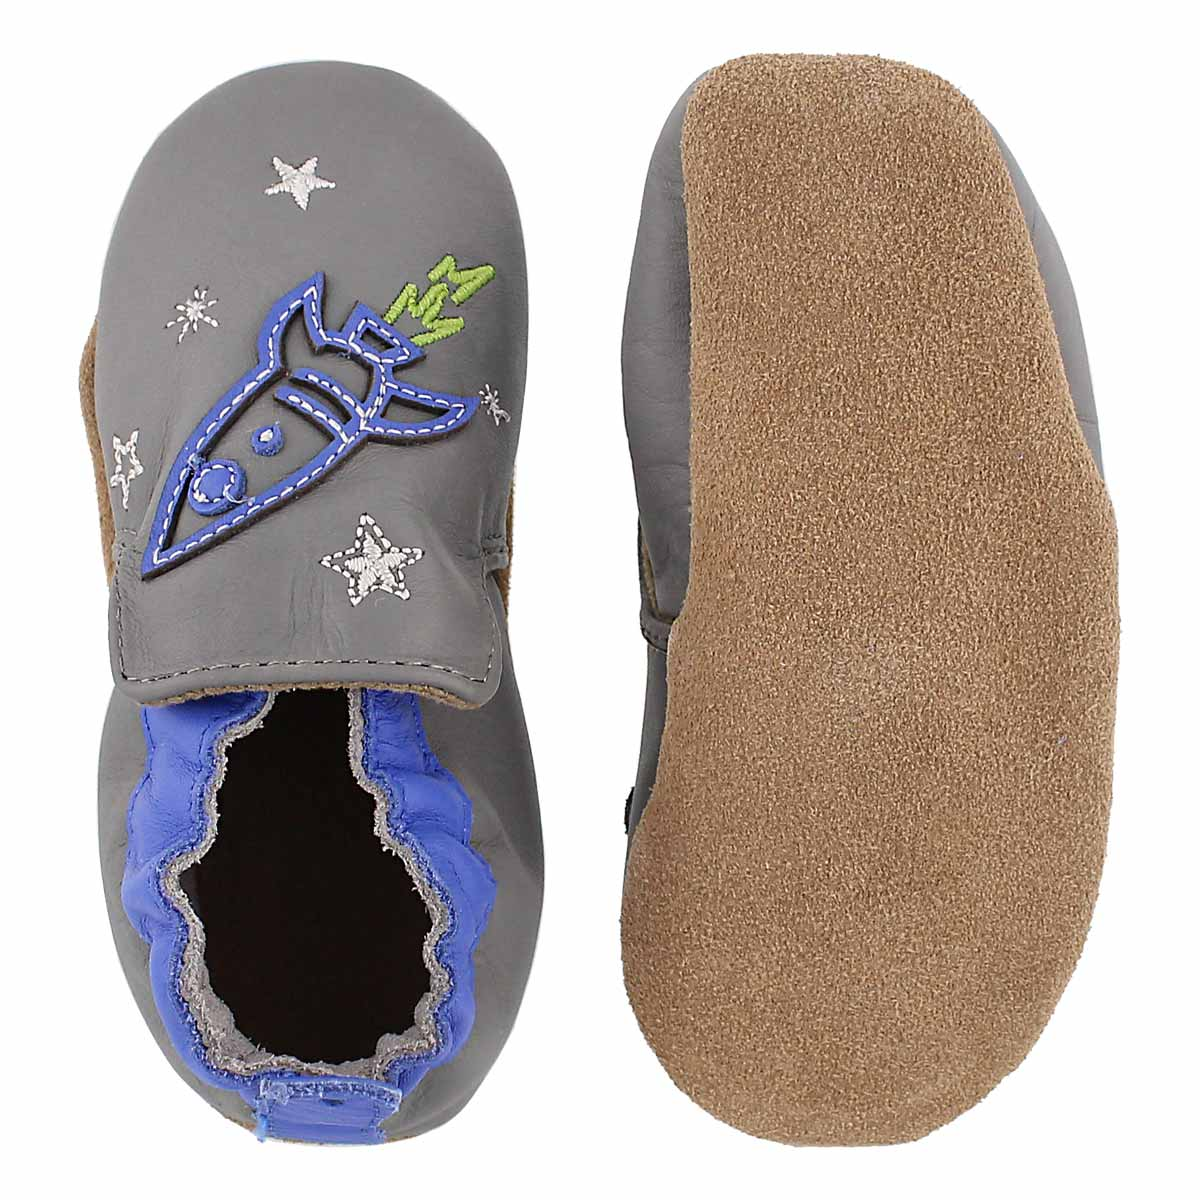 Inf Space and Stars gry/blu soft slipper